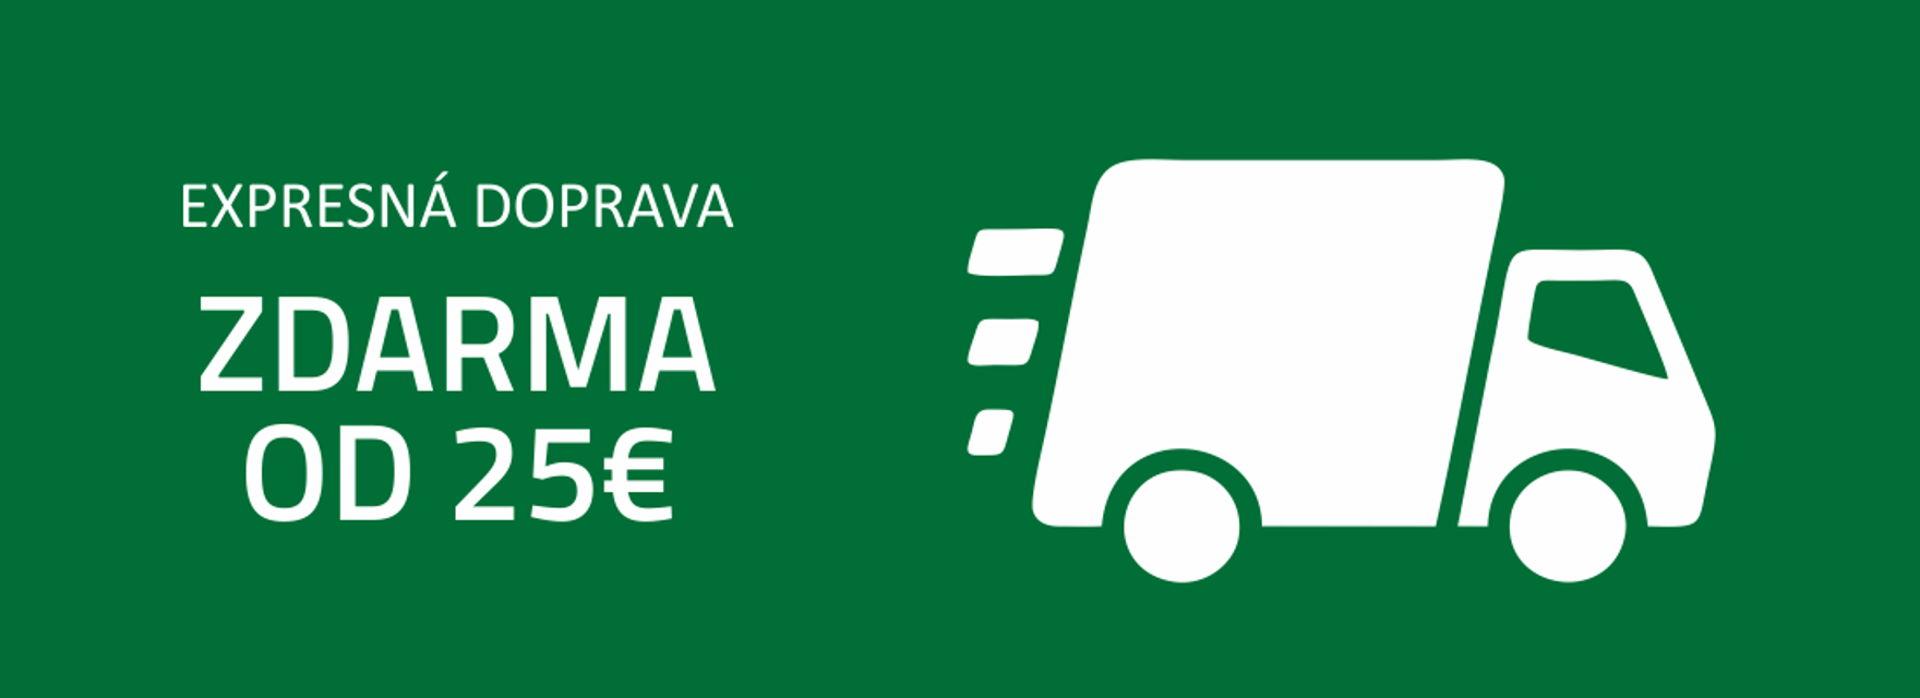 Doprava zdarma od 25€!